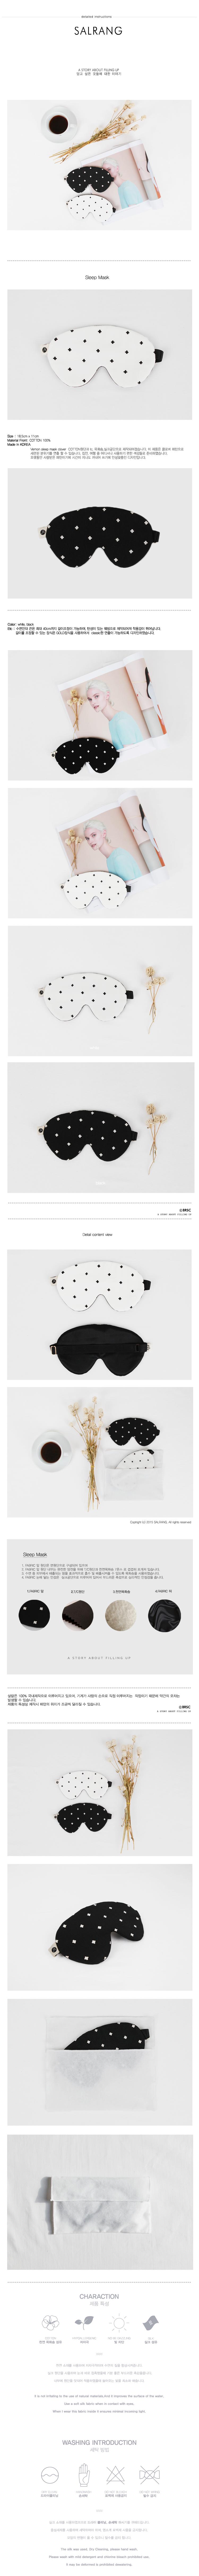 Vernon sleep mask 004 clover white - 살랑, 18,000원, 편의용품, 목쿠션/안대/슬리퍼